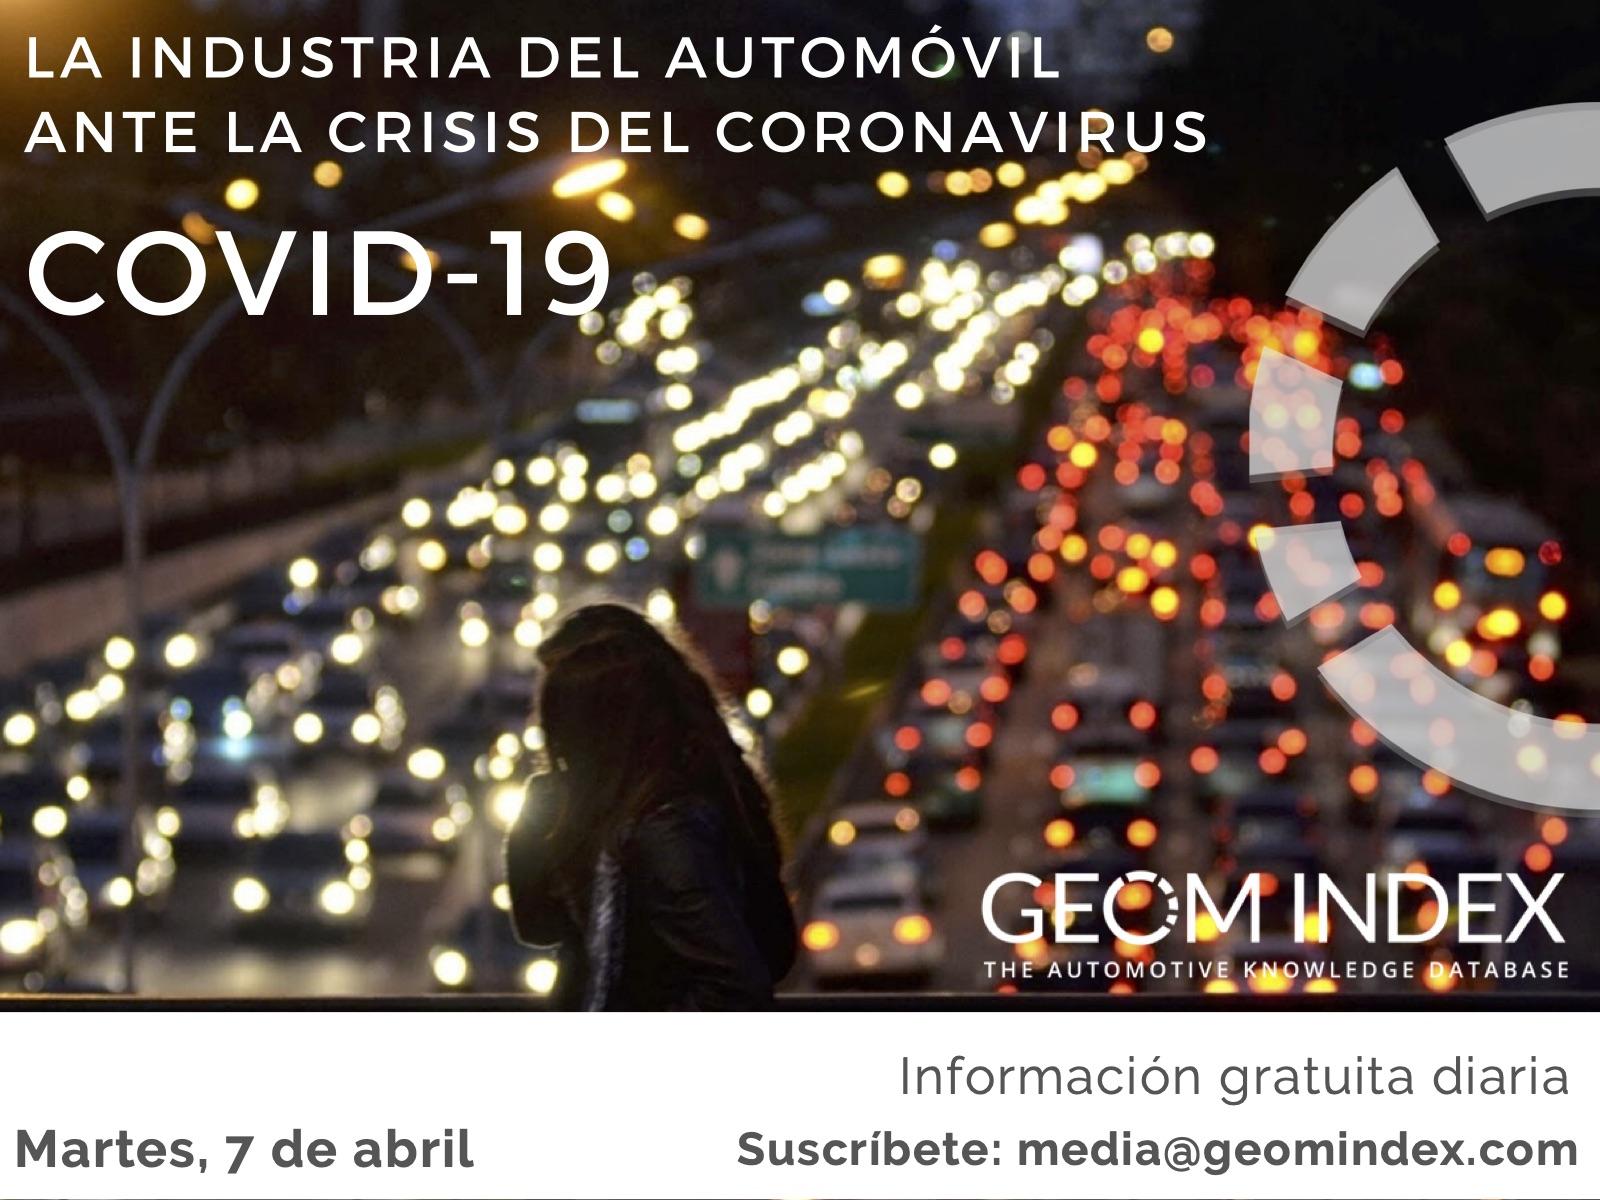 Informe 7 de abril – La industria del automóvil ante la crisis del Covid-19